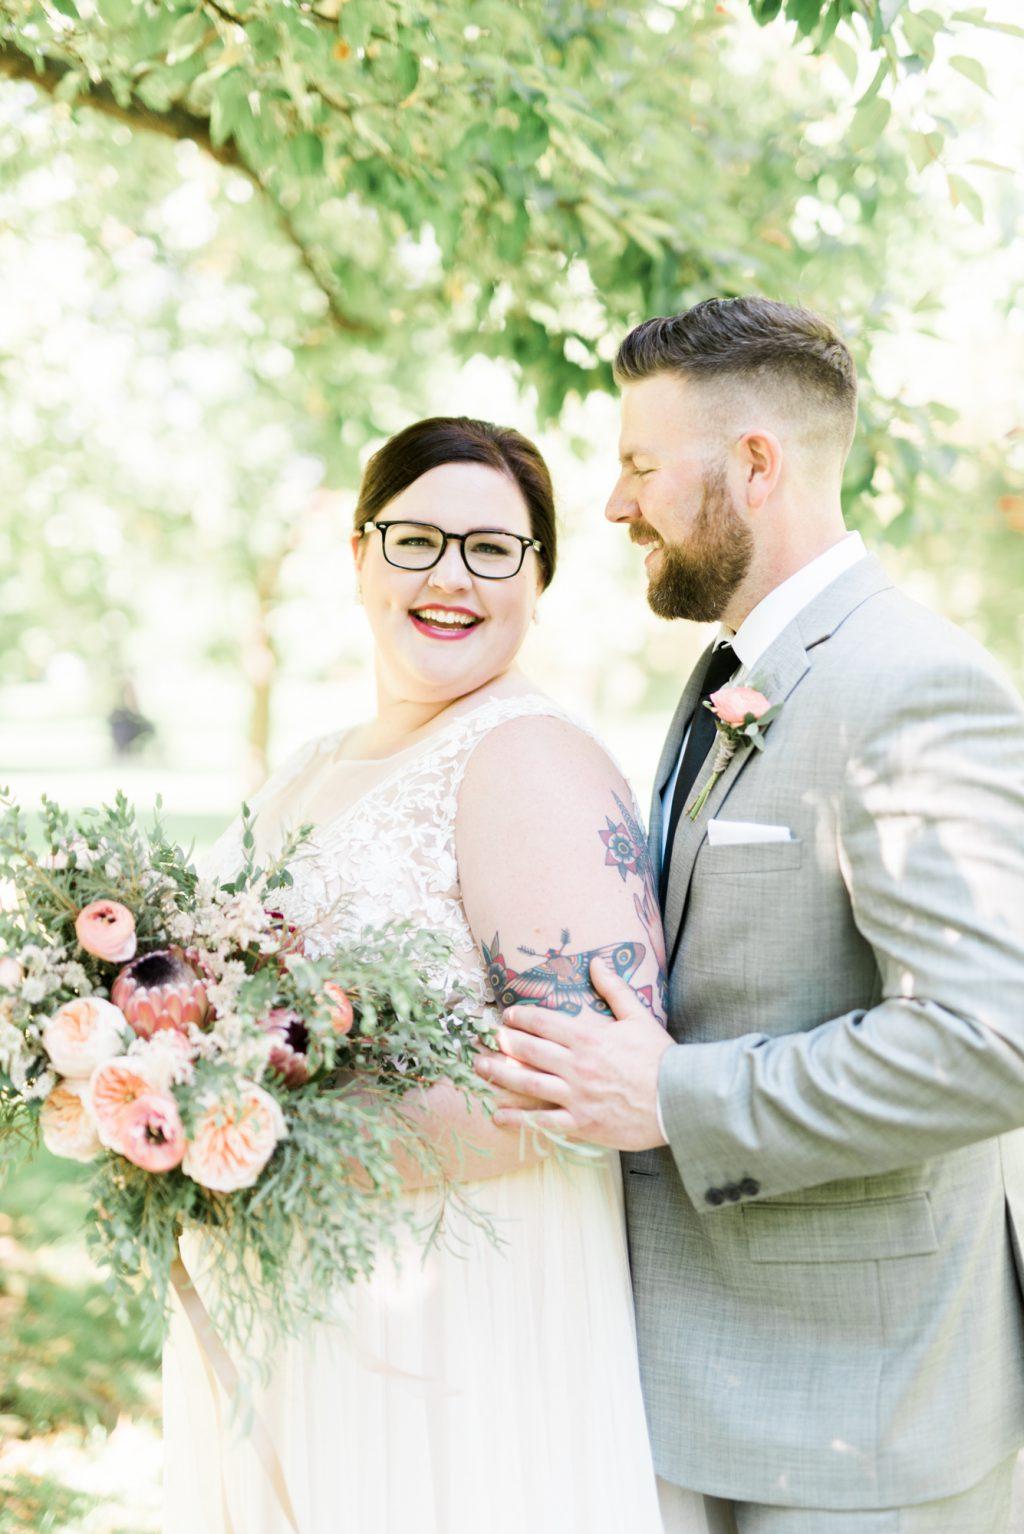 haley-richter-photo-west-chester-summer-wedding-boxcar-brewery-098